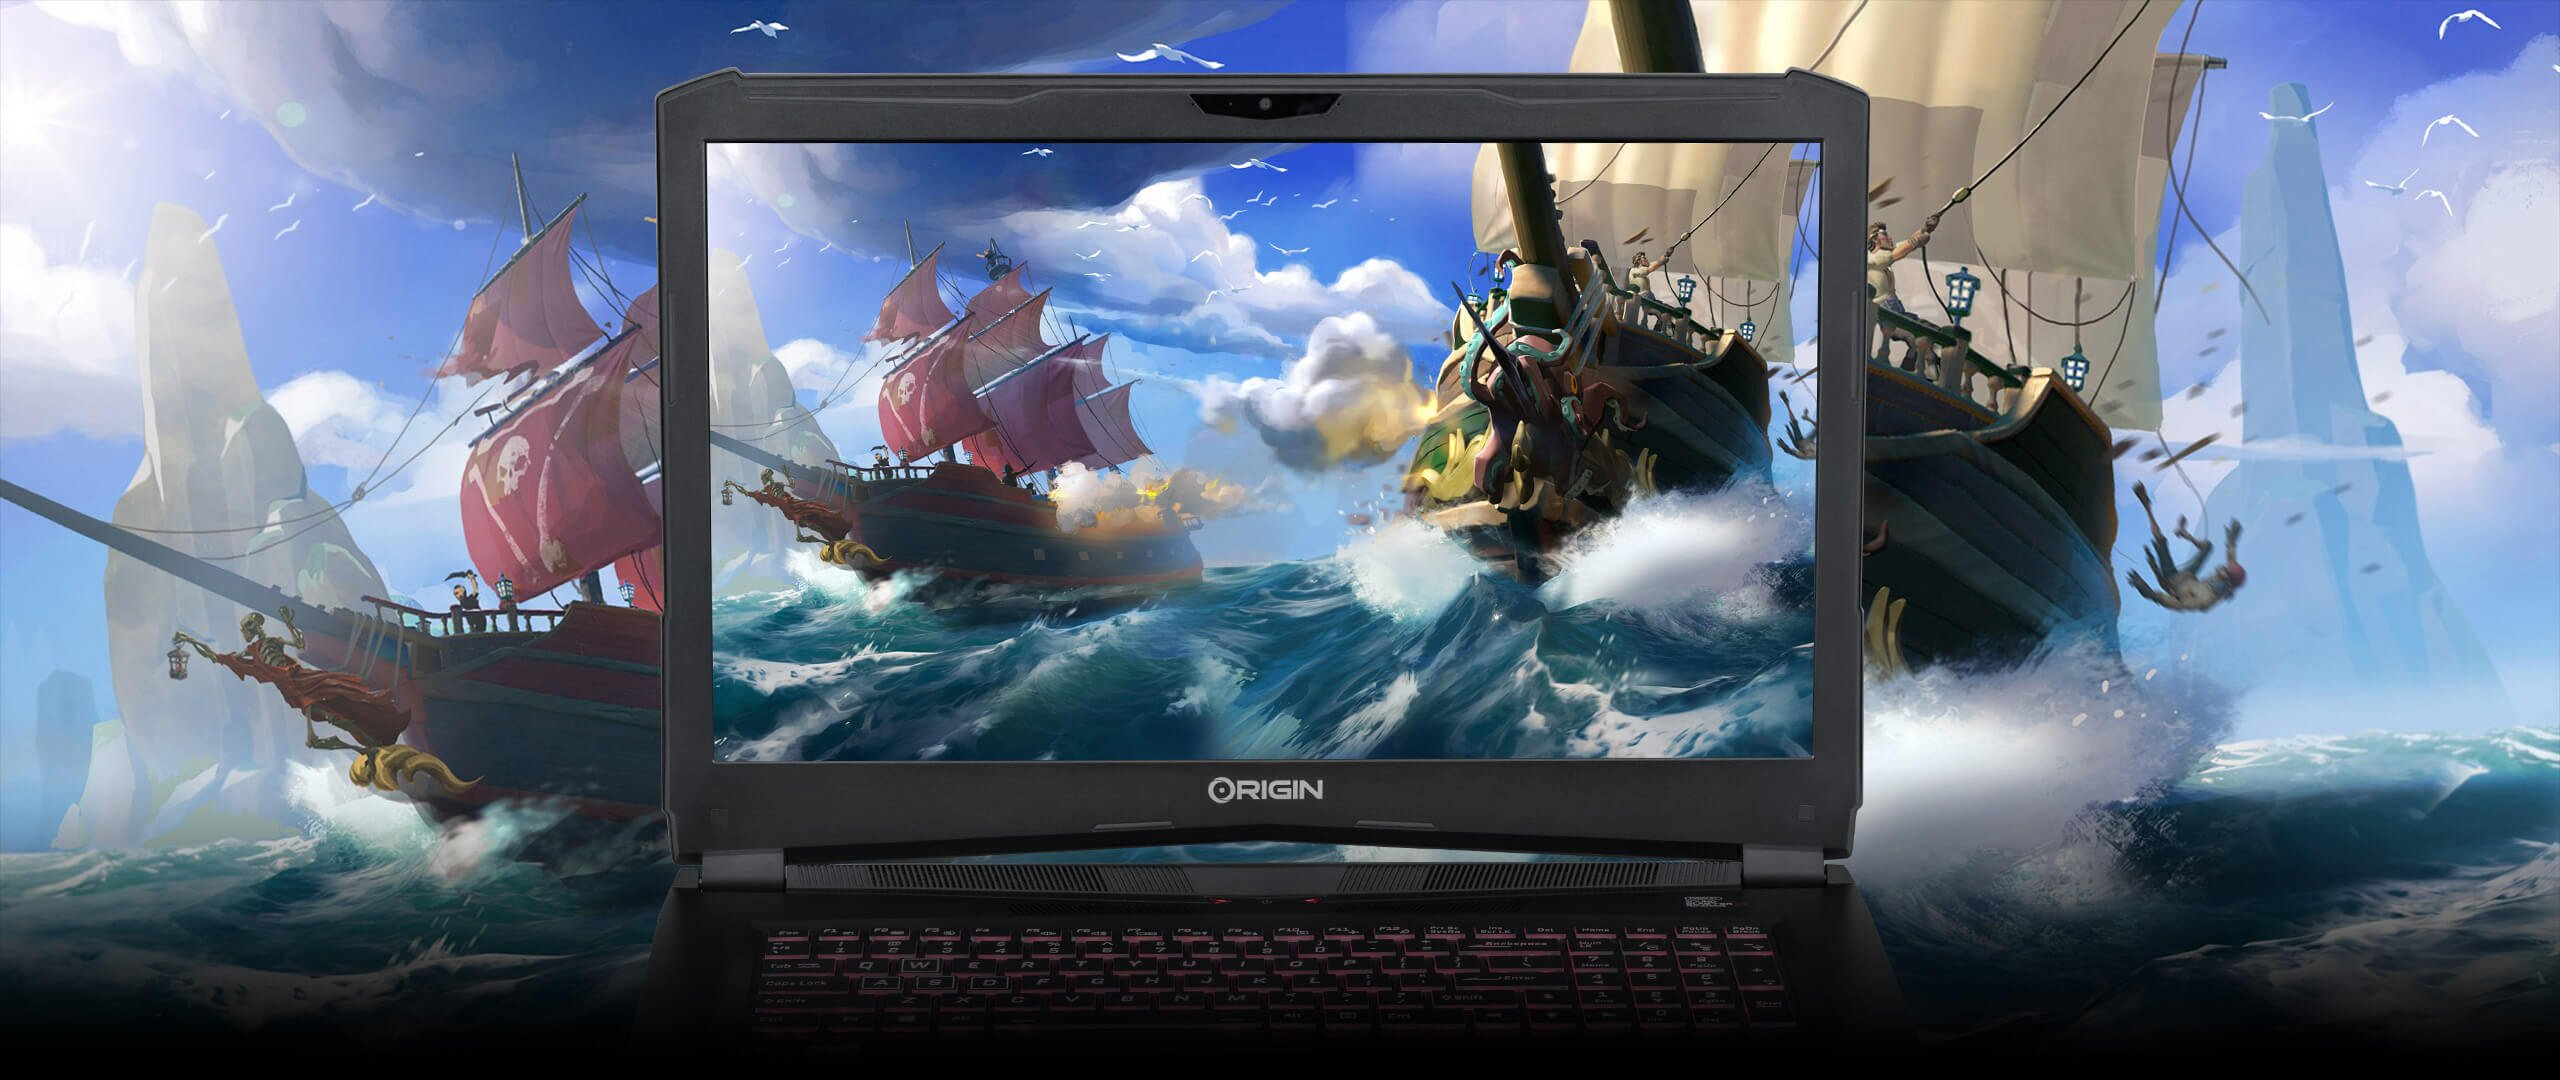 Origin PC EVO17-S Laptop review: An uncompromising desktop